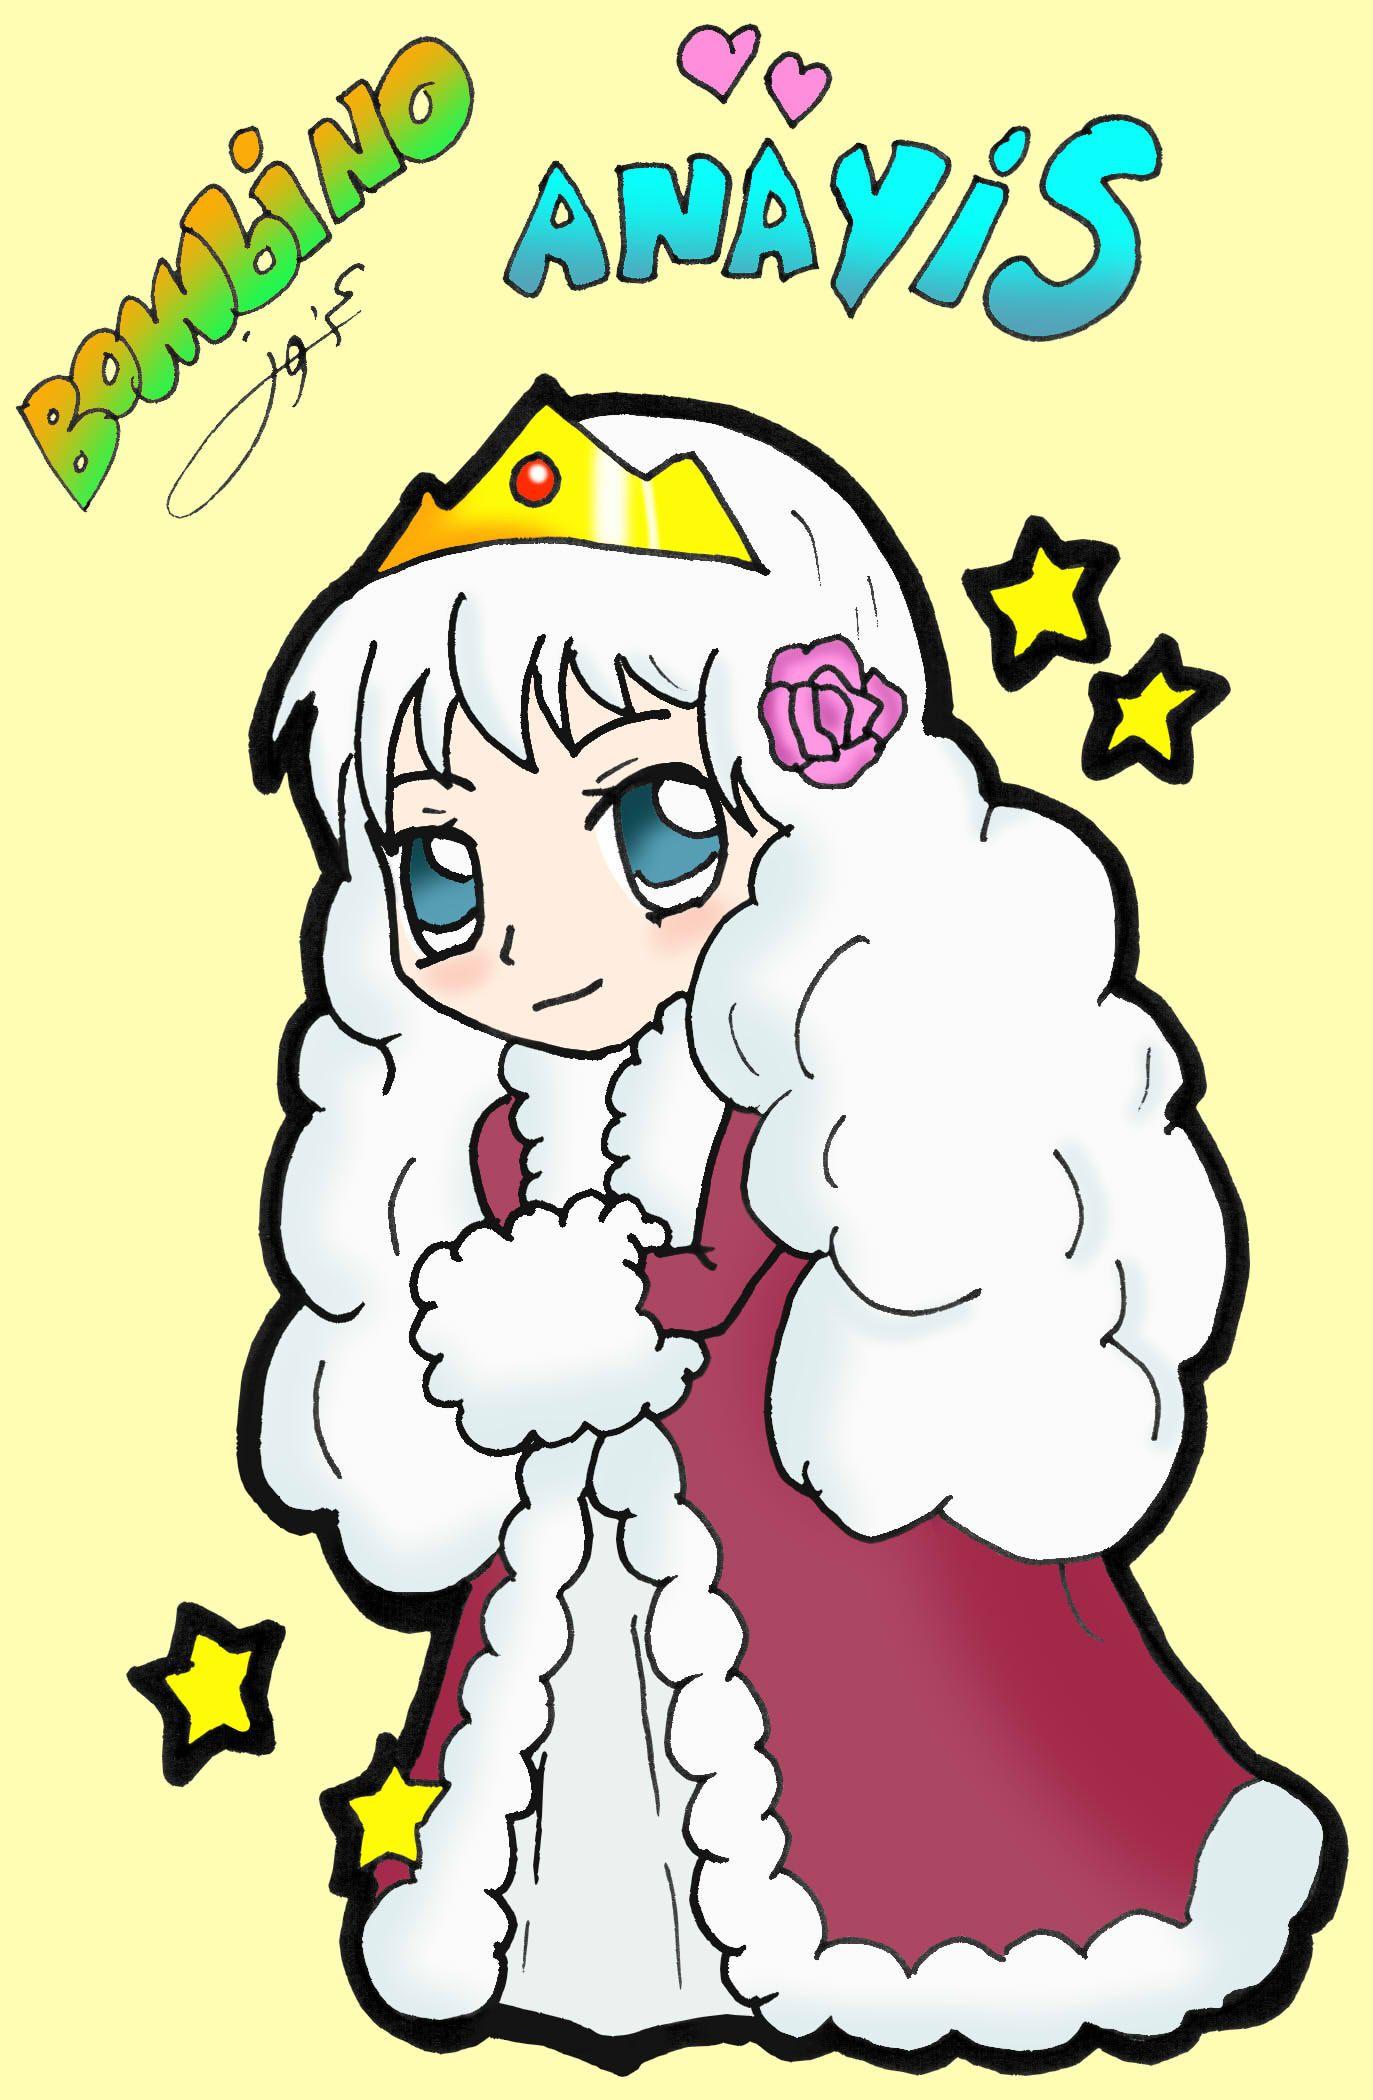 اناييس كنزة Chibi Mario Characters Character